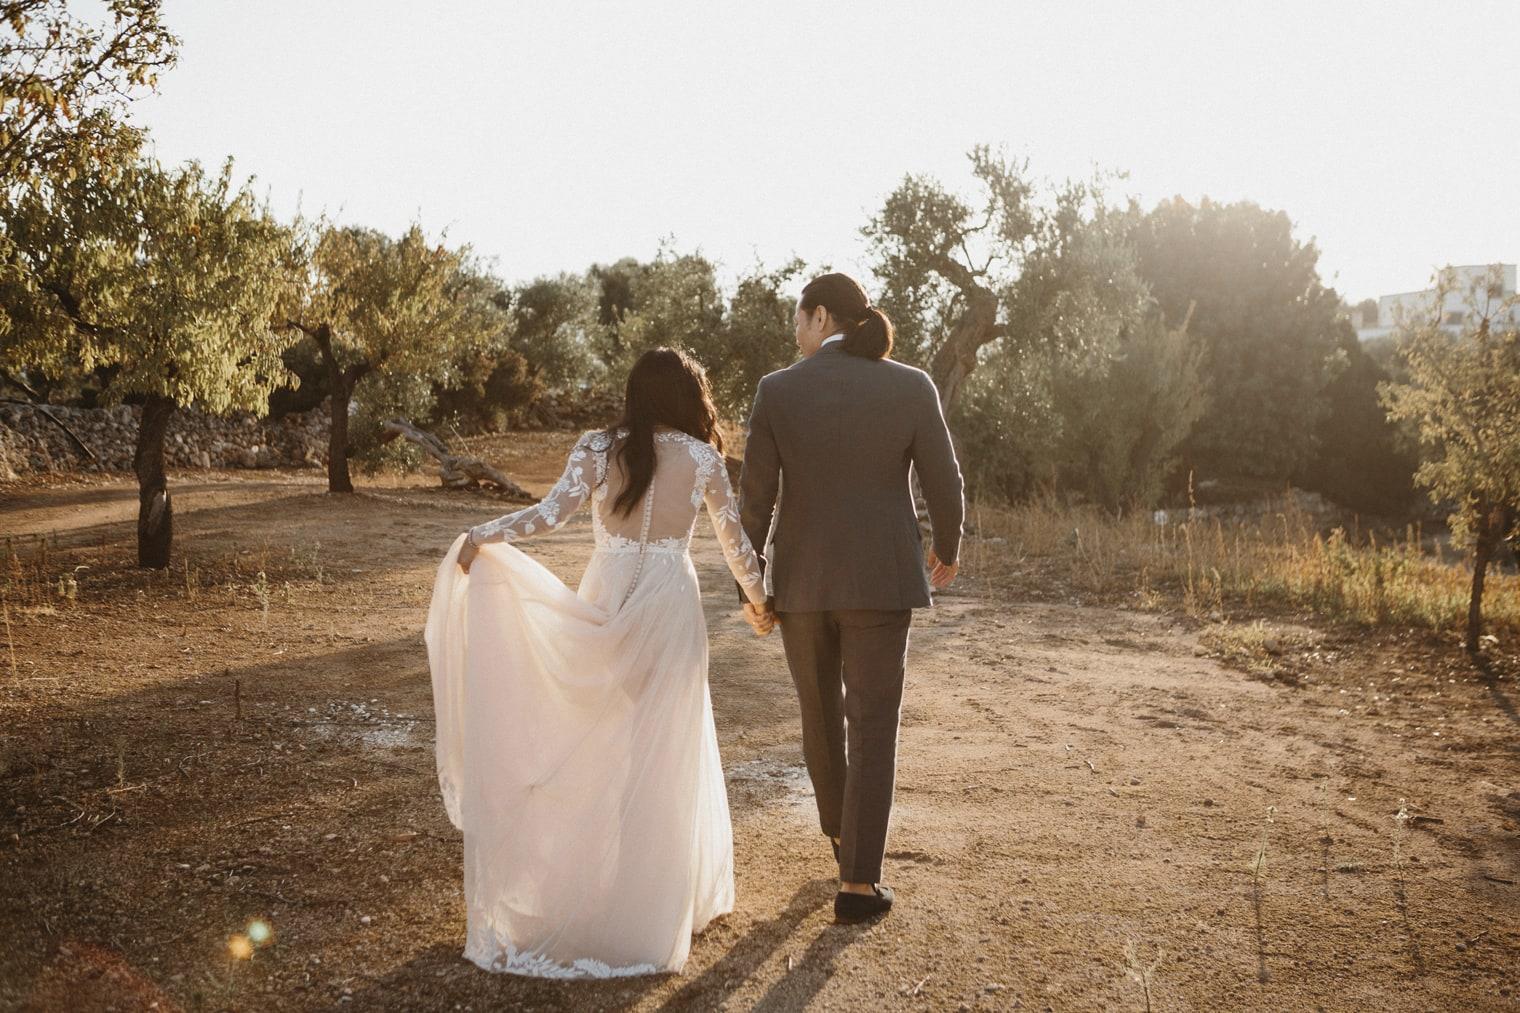 Puglia Wedding Photographer captures bride wearing Hermoine de paula gown in italy walking through an olive tree field